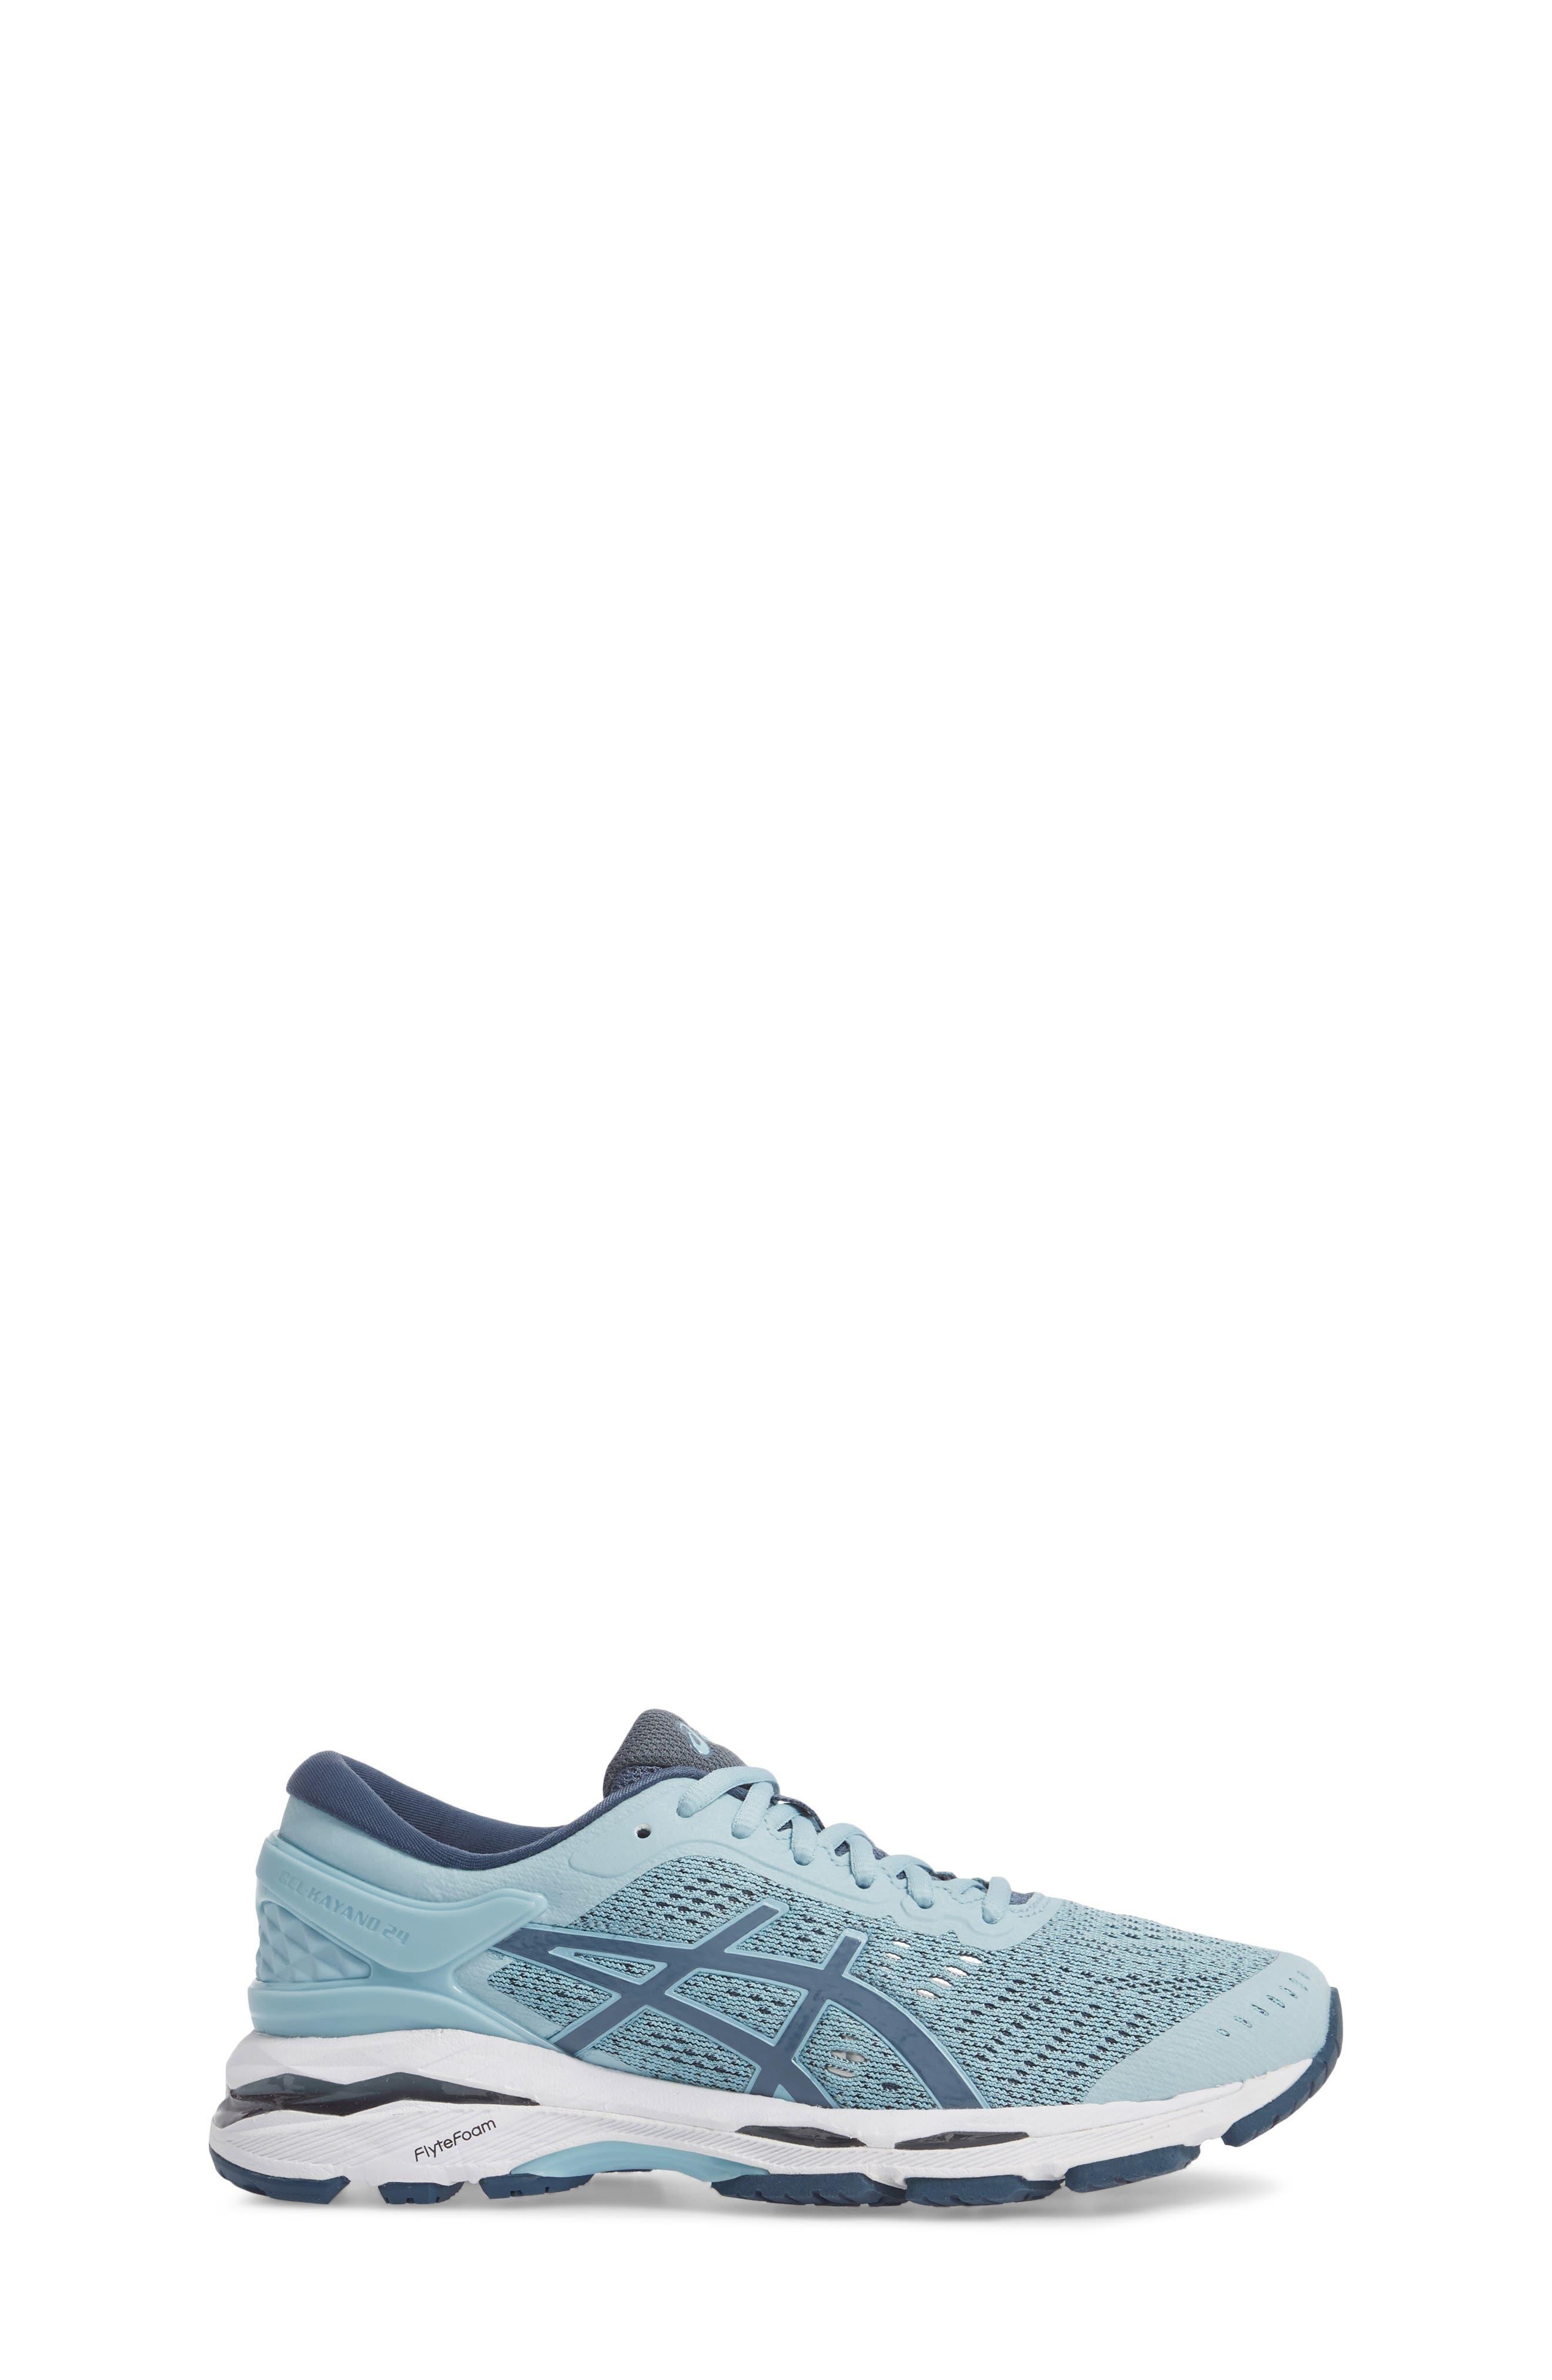 GEL-Kayano<sup>®</sup> 24 GS Running Shoe,                             Alternate thumbnail 6, color,